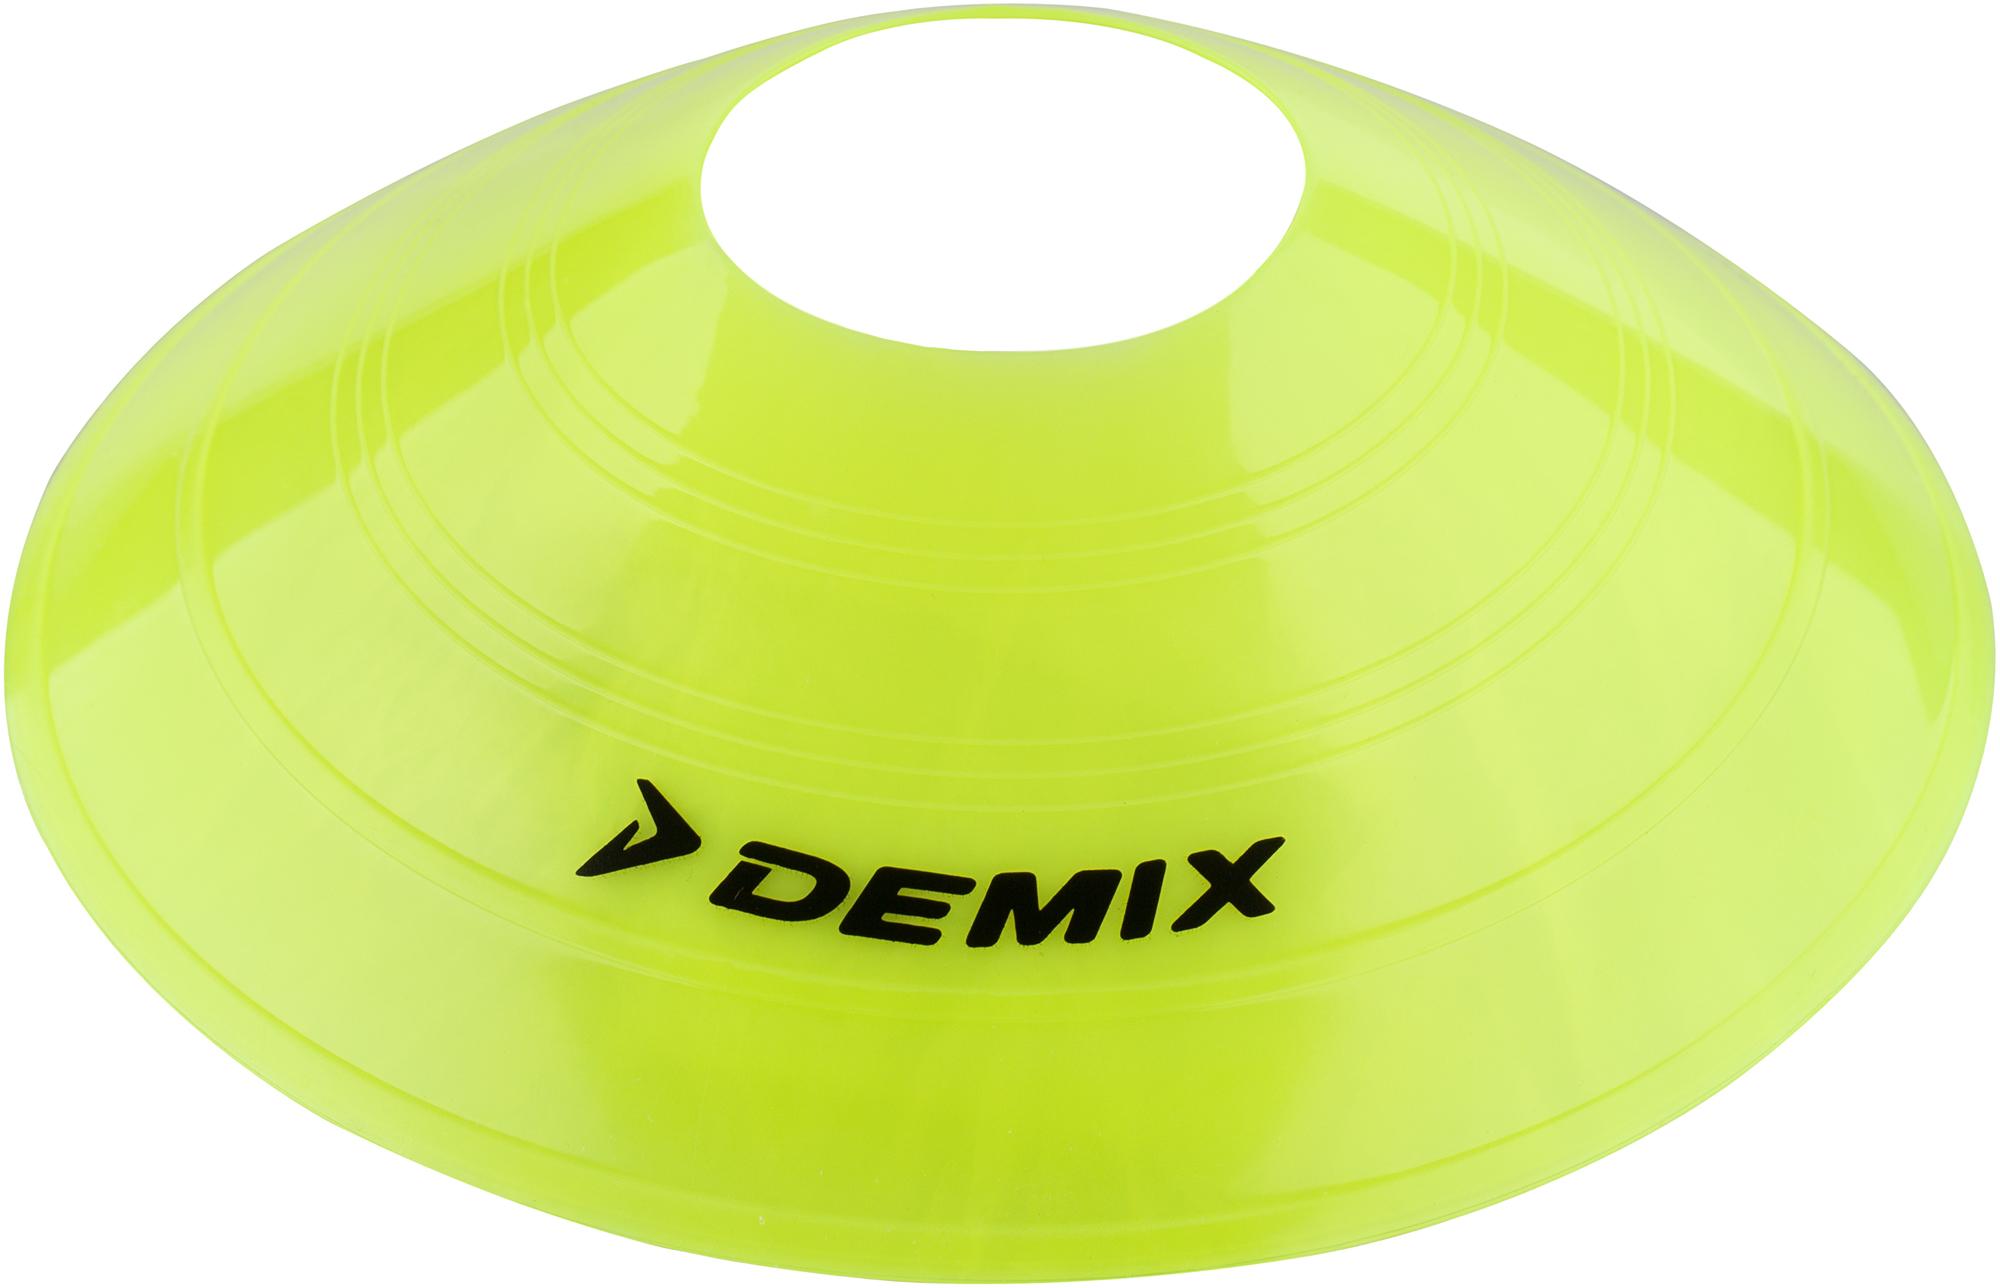 Demix Набор для футбола: фишки разметки поля Demix, 10 шт.